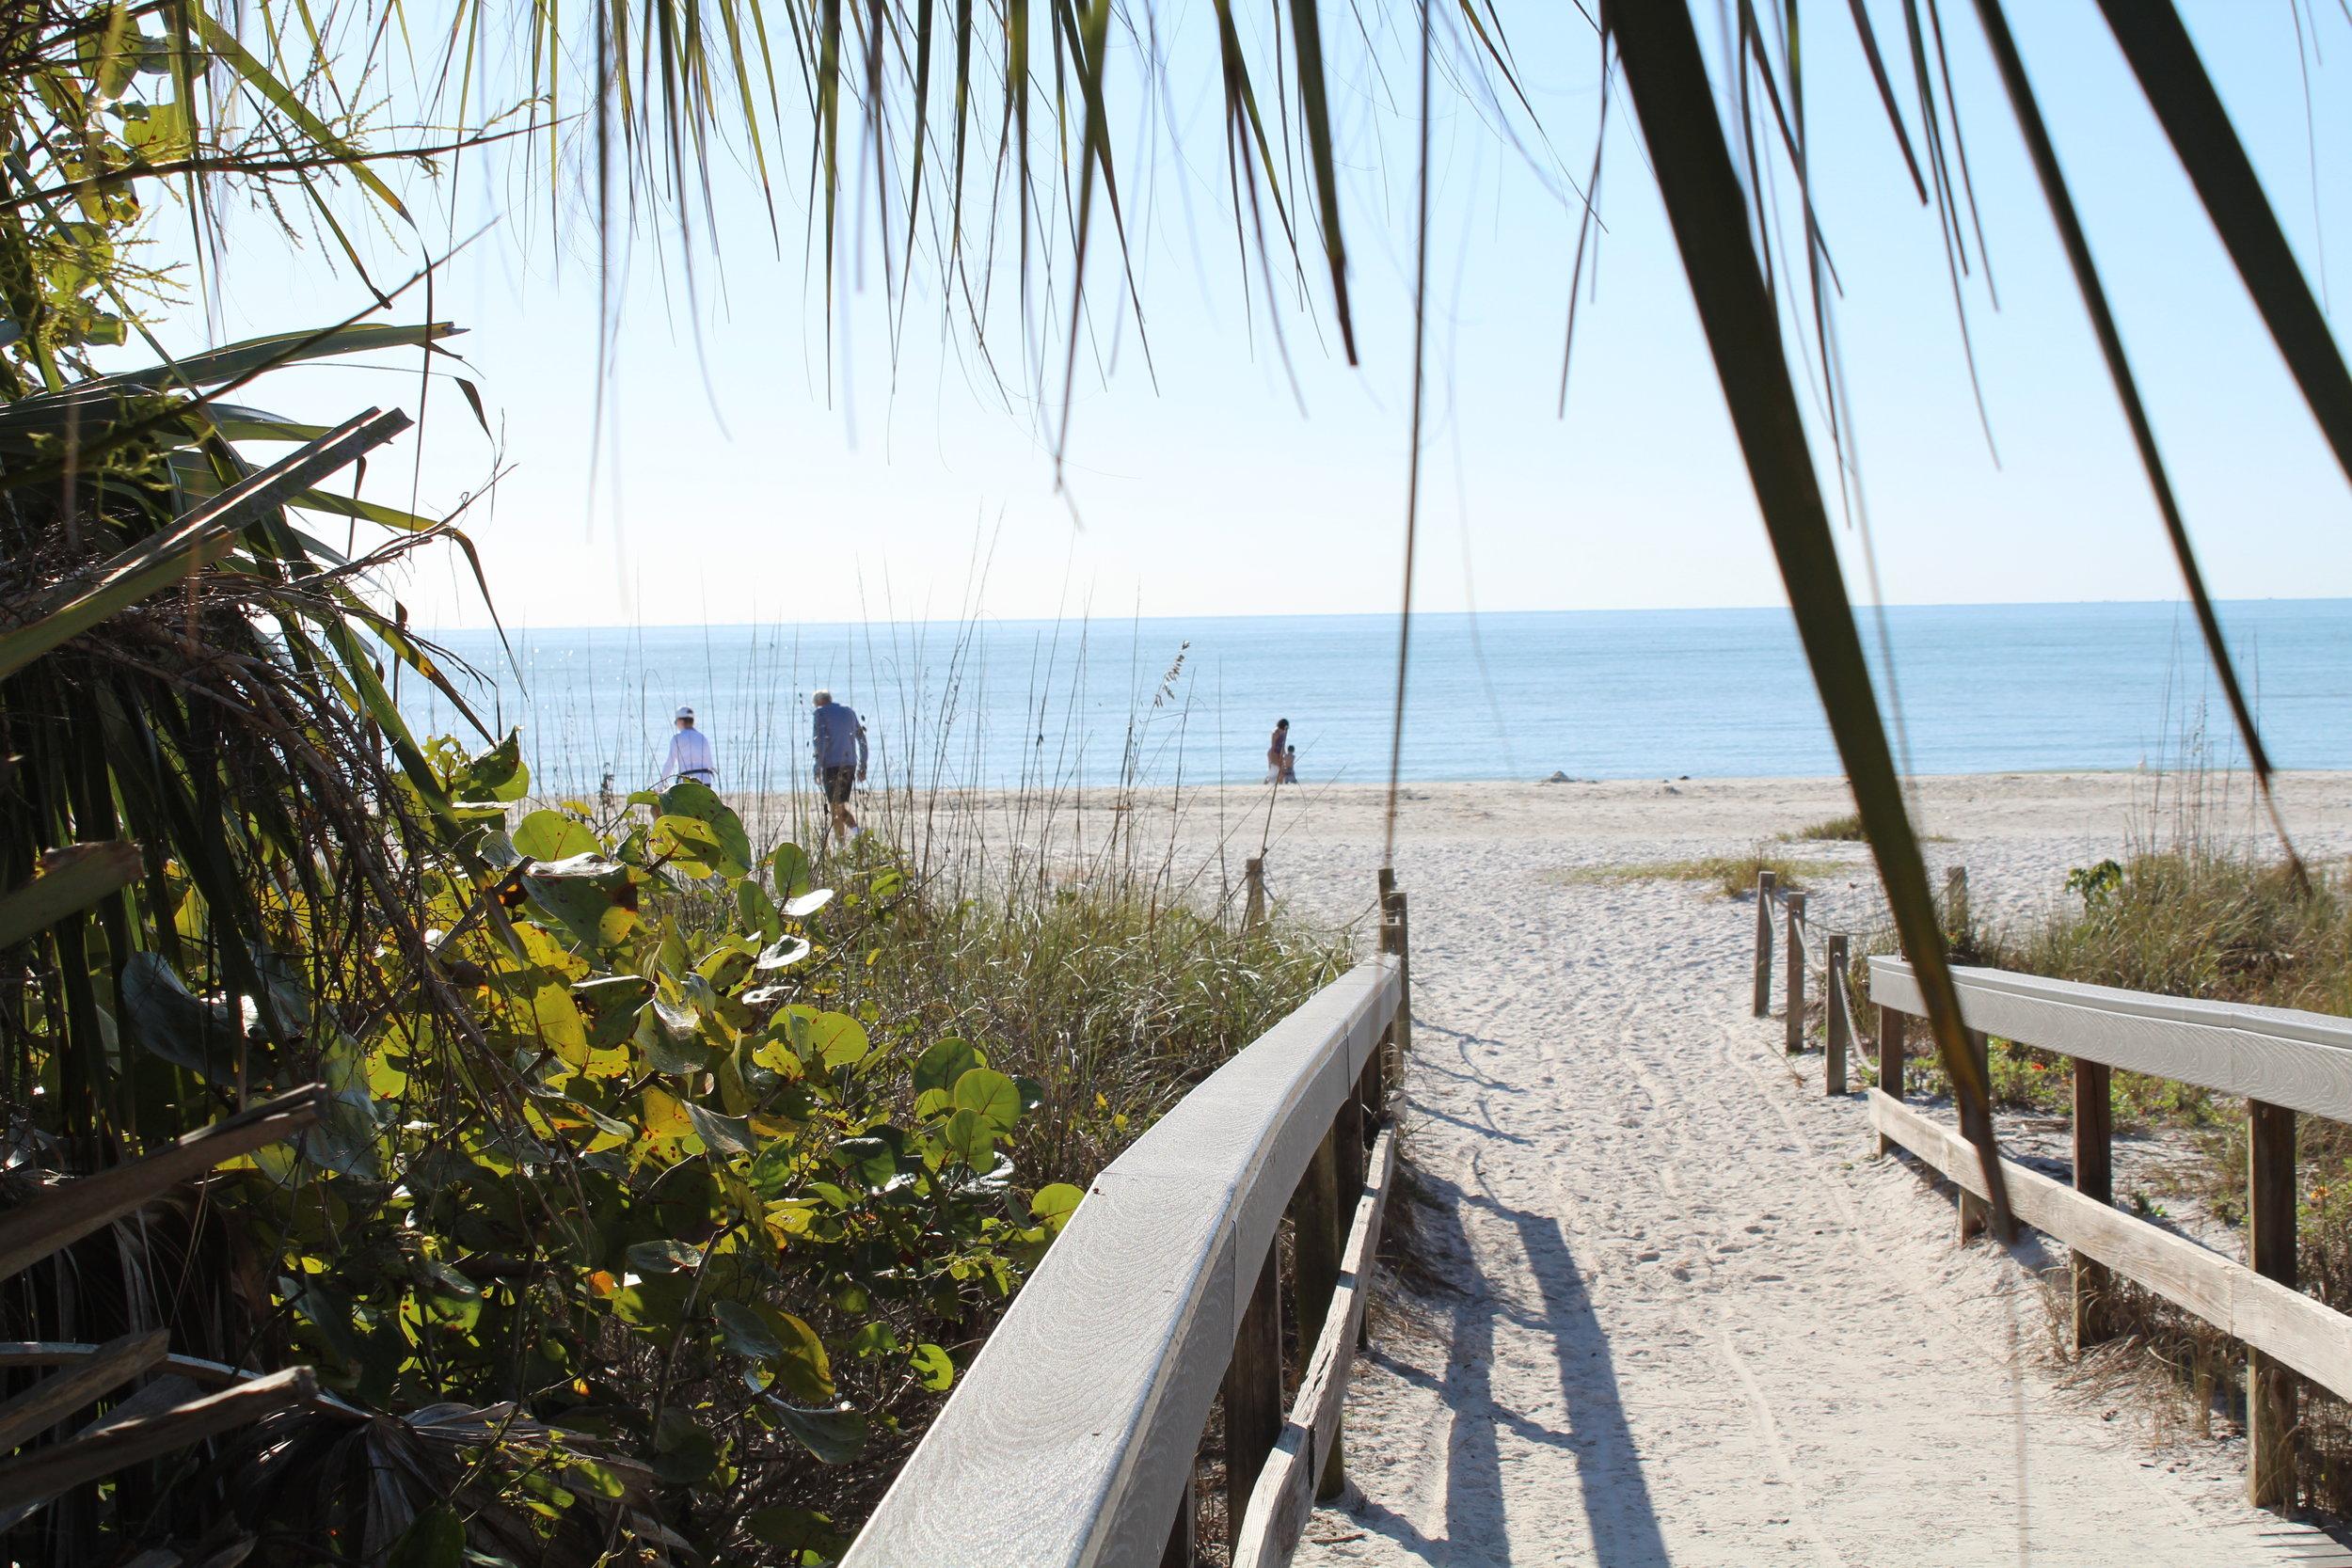 Beach walkover from the neighborhood